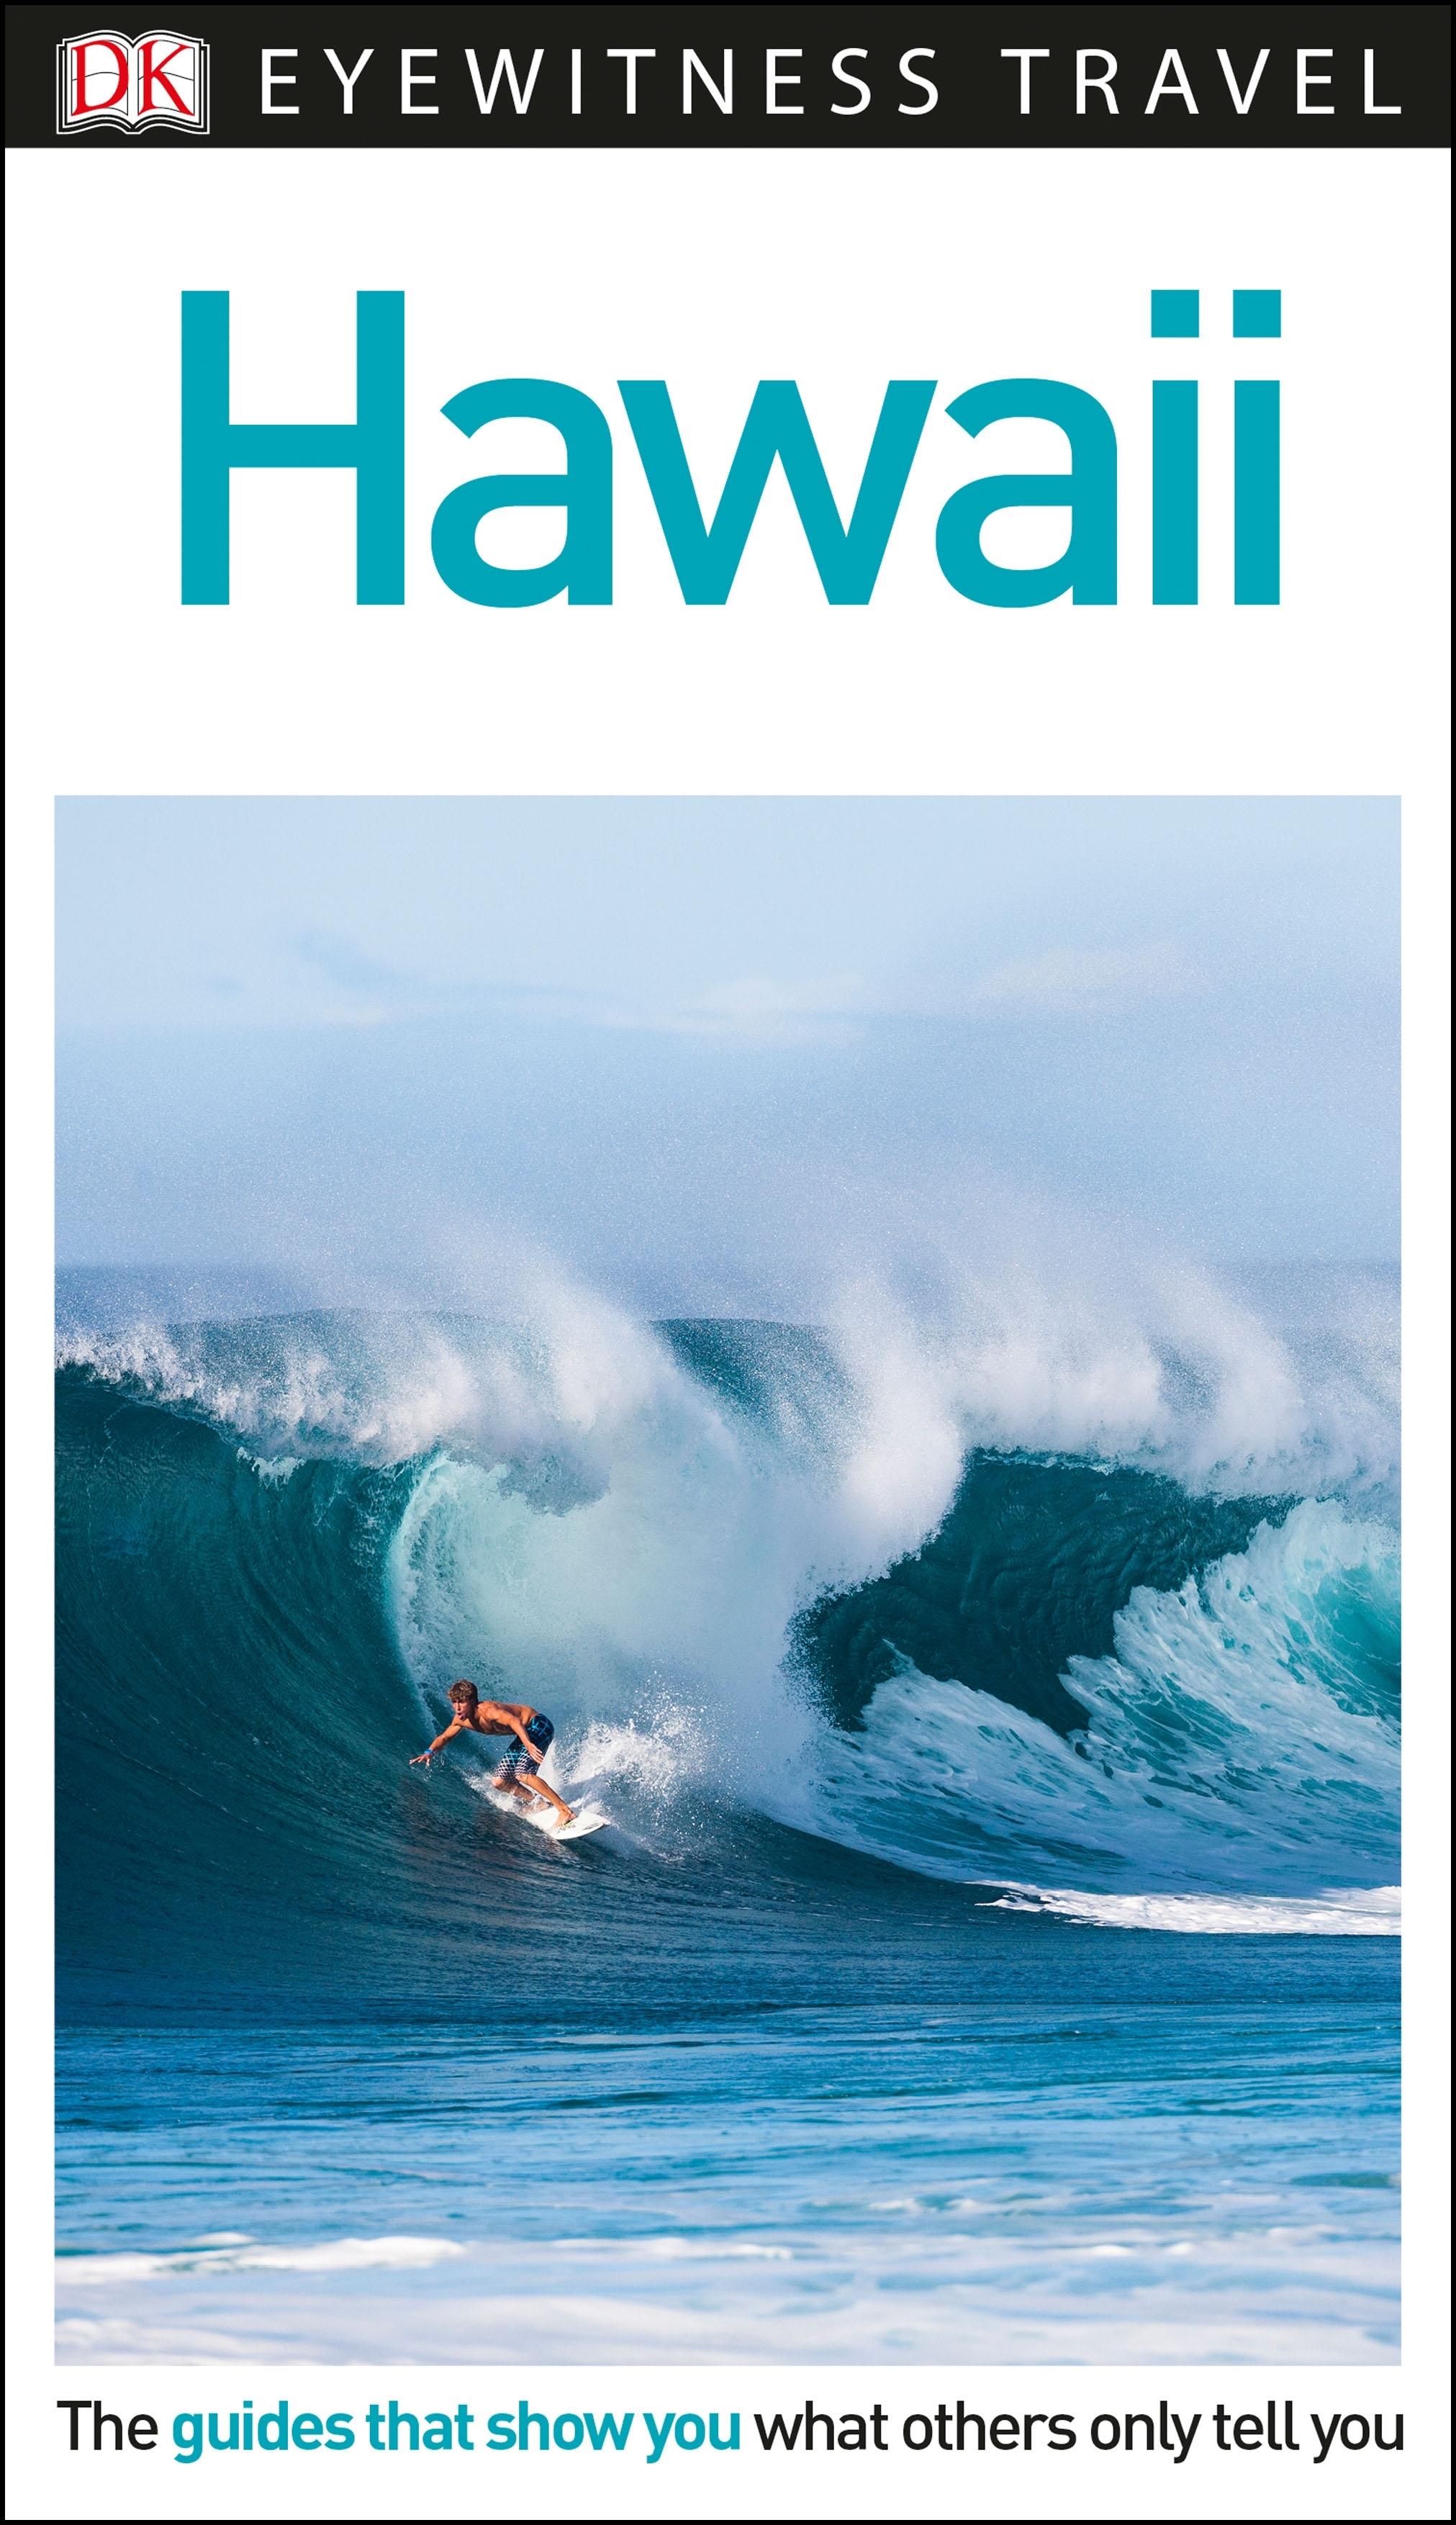 hawaii eyewitness travel guide by dk penguin books australia. Black Bedroom Furniture Sets. Home Design Ideas